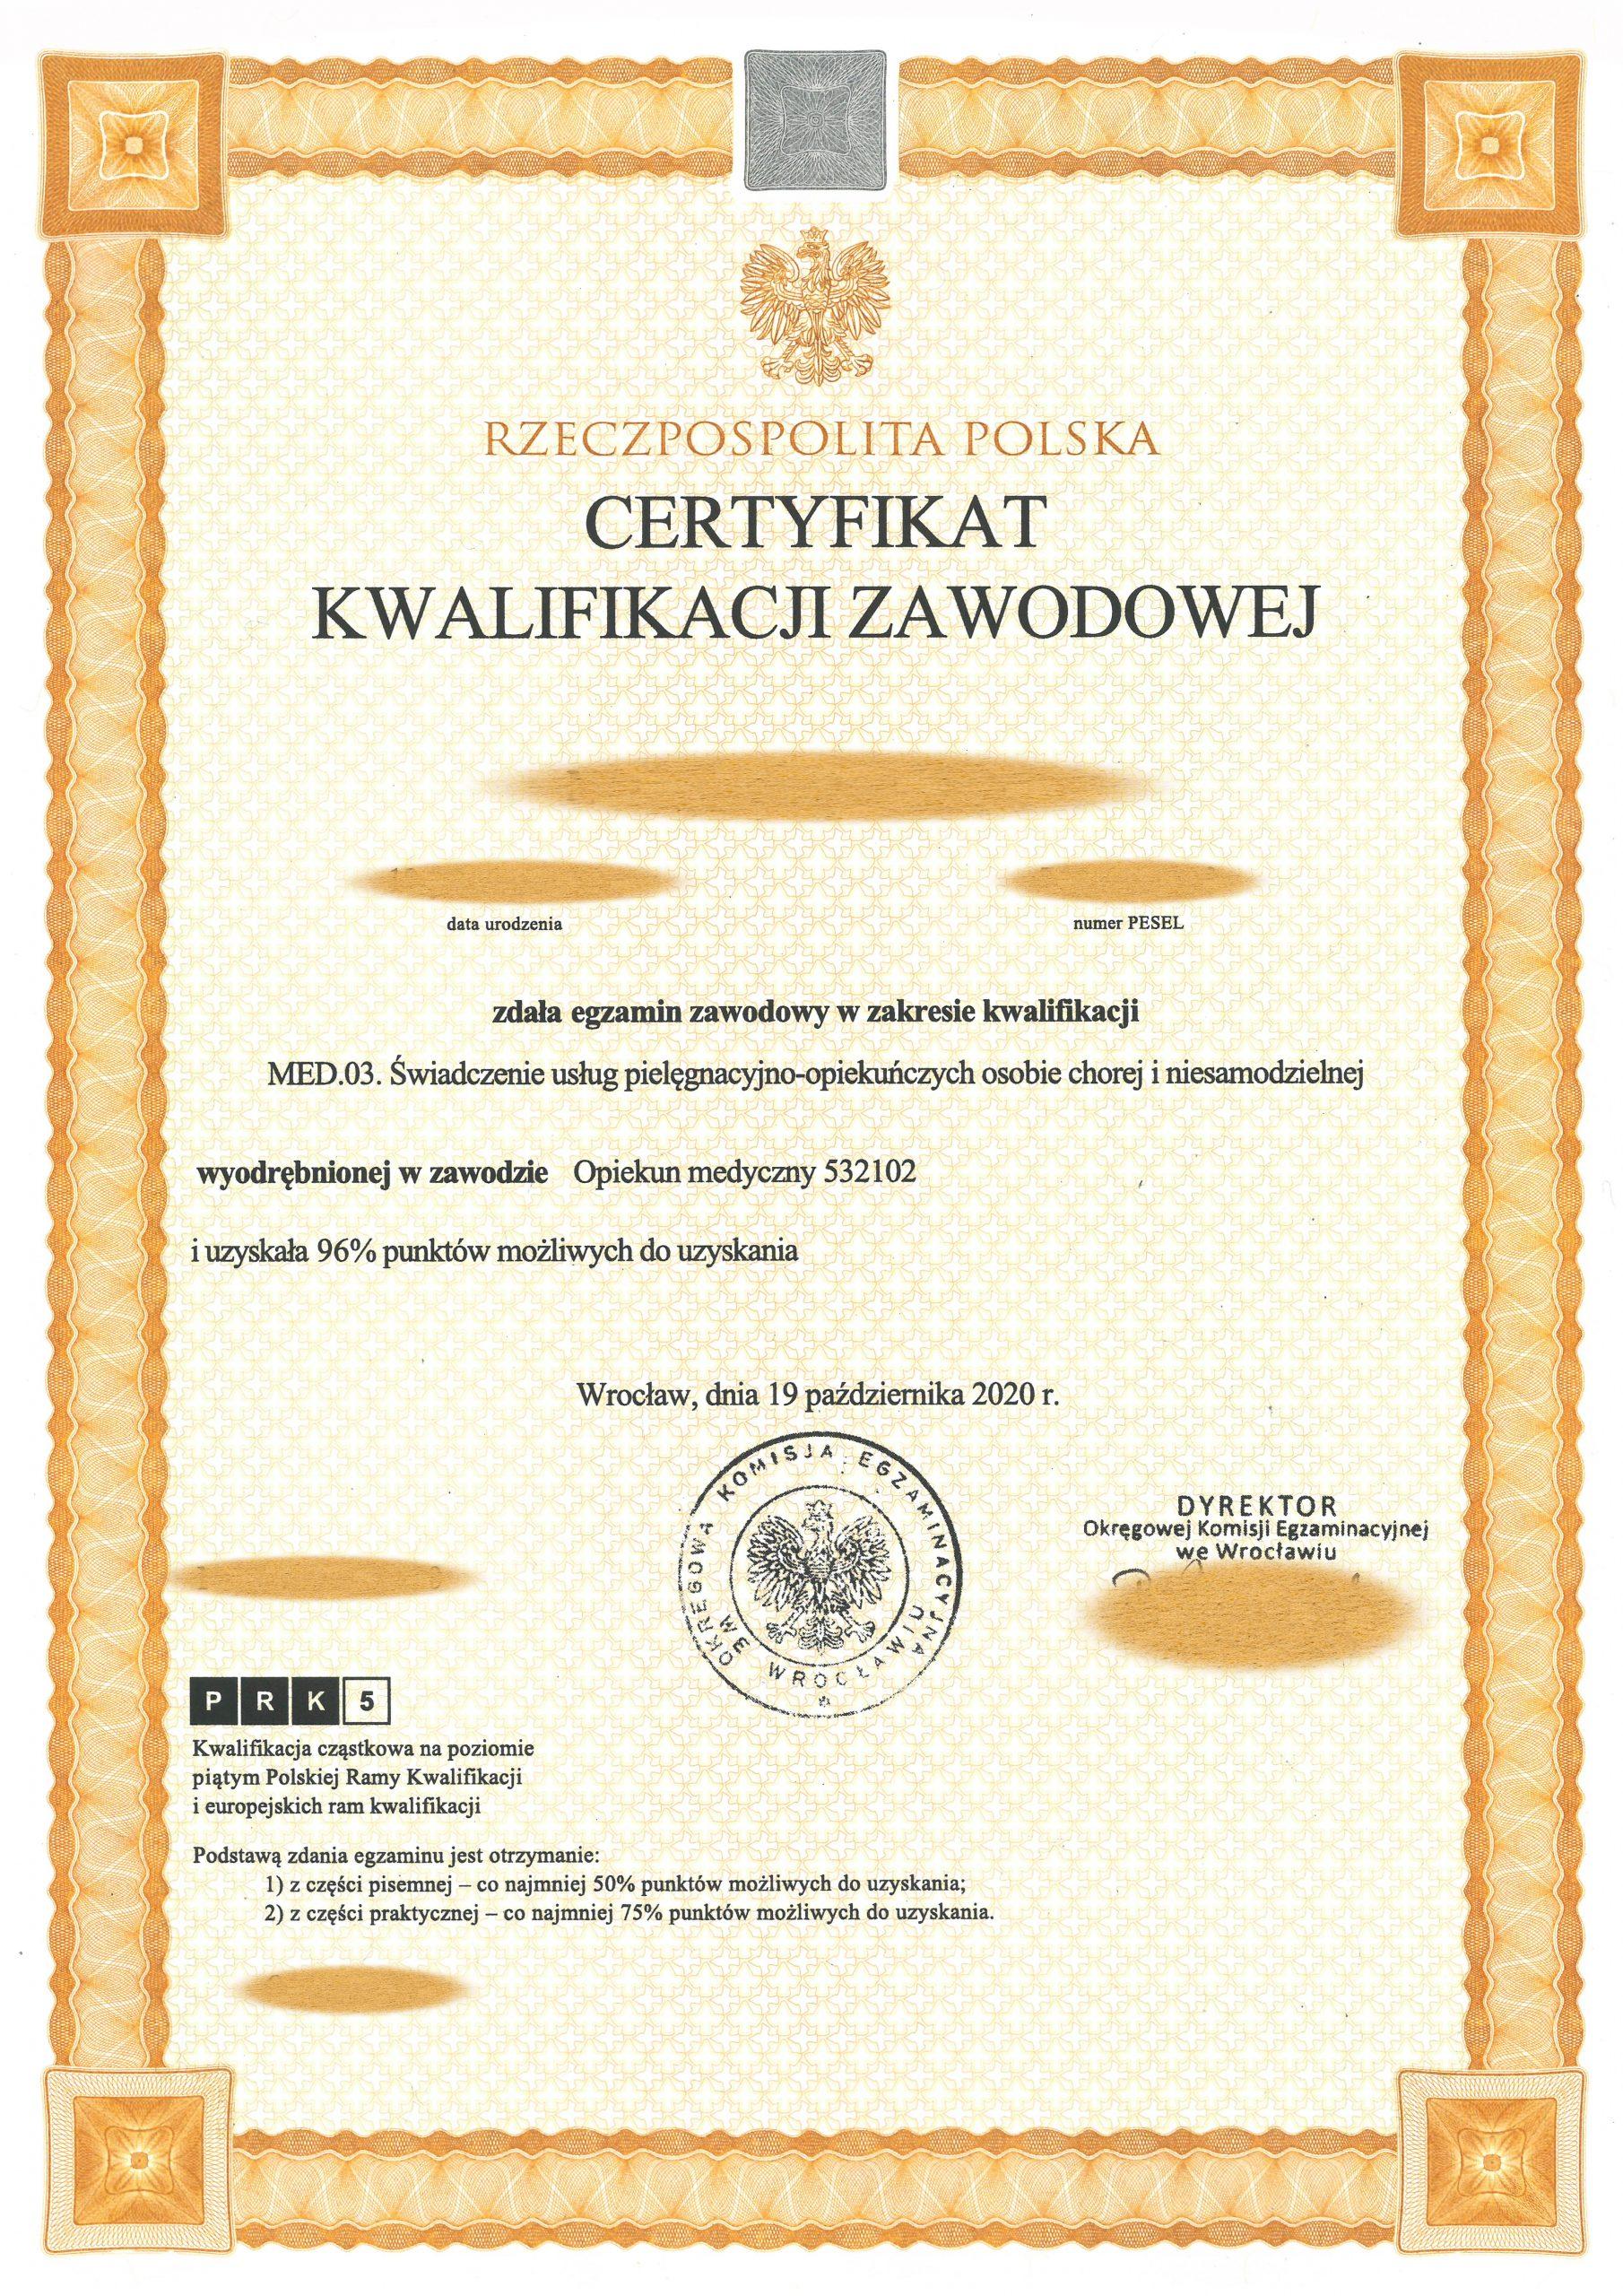 Certyfikat OKE